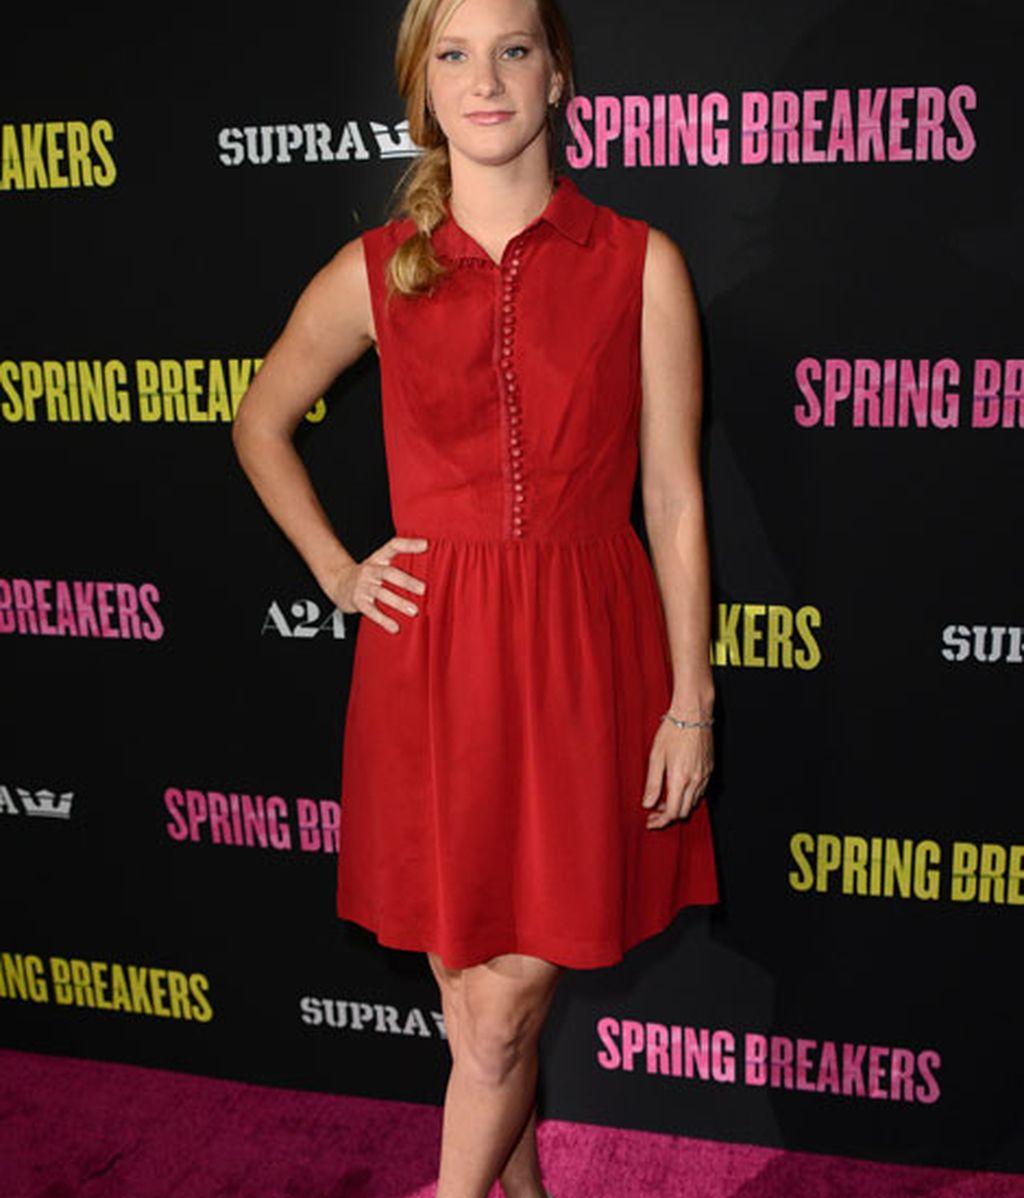 La actriz Heather Morris